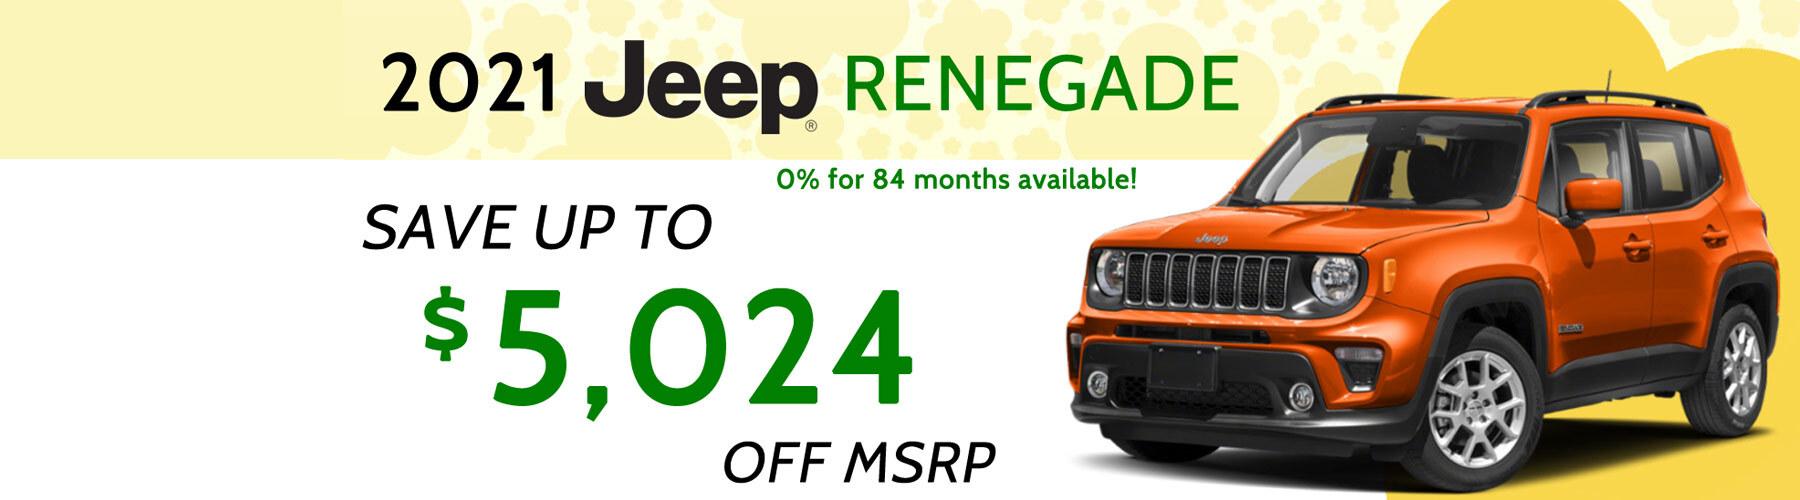 Renegade Offer